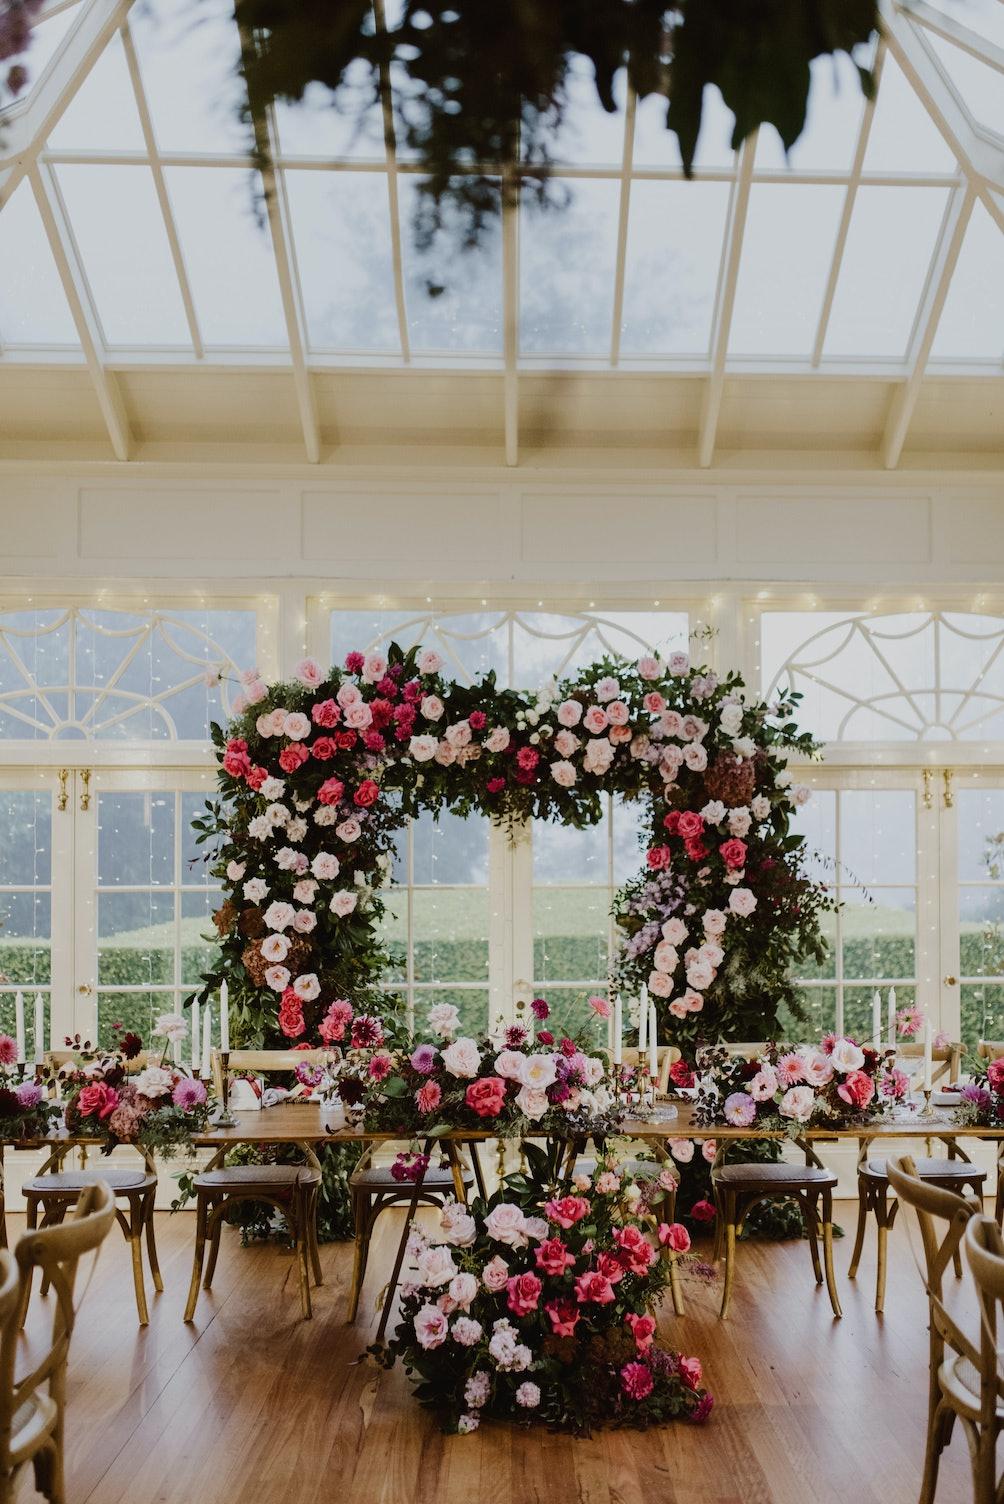 Floral arbour at reception